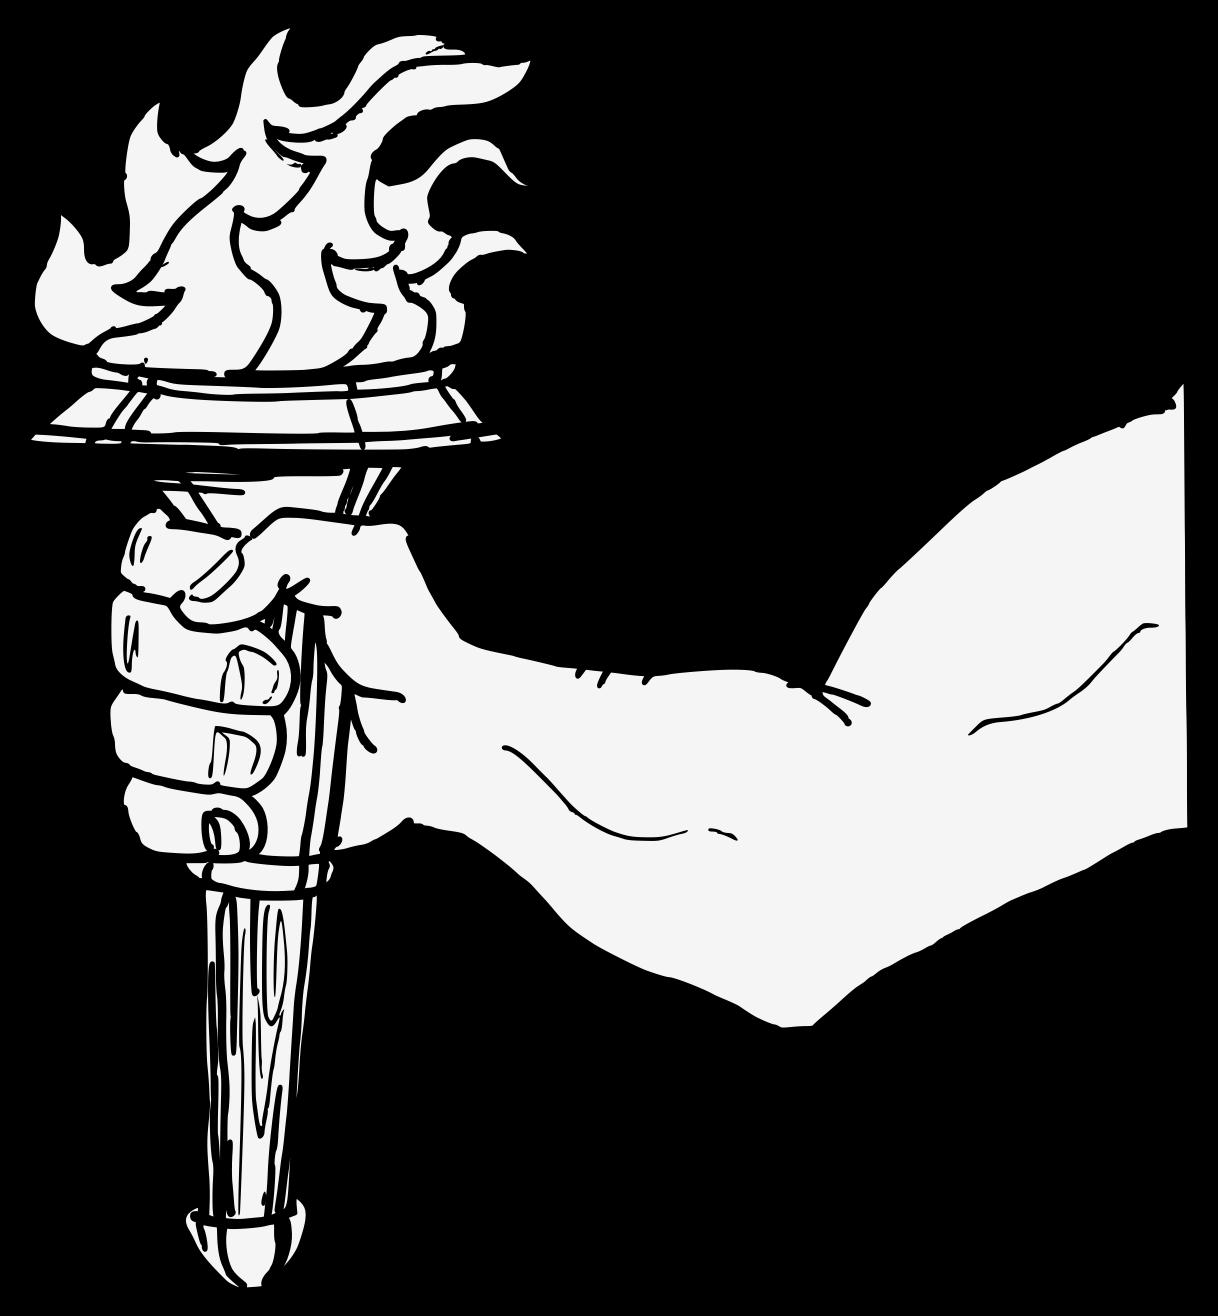 Arm traceable heraldic art. Torch clipart hand